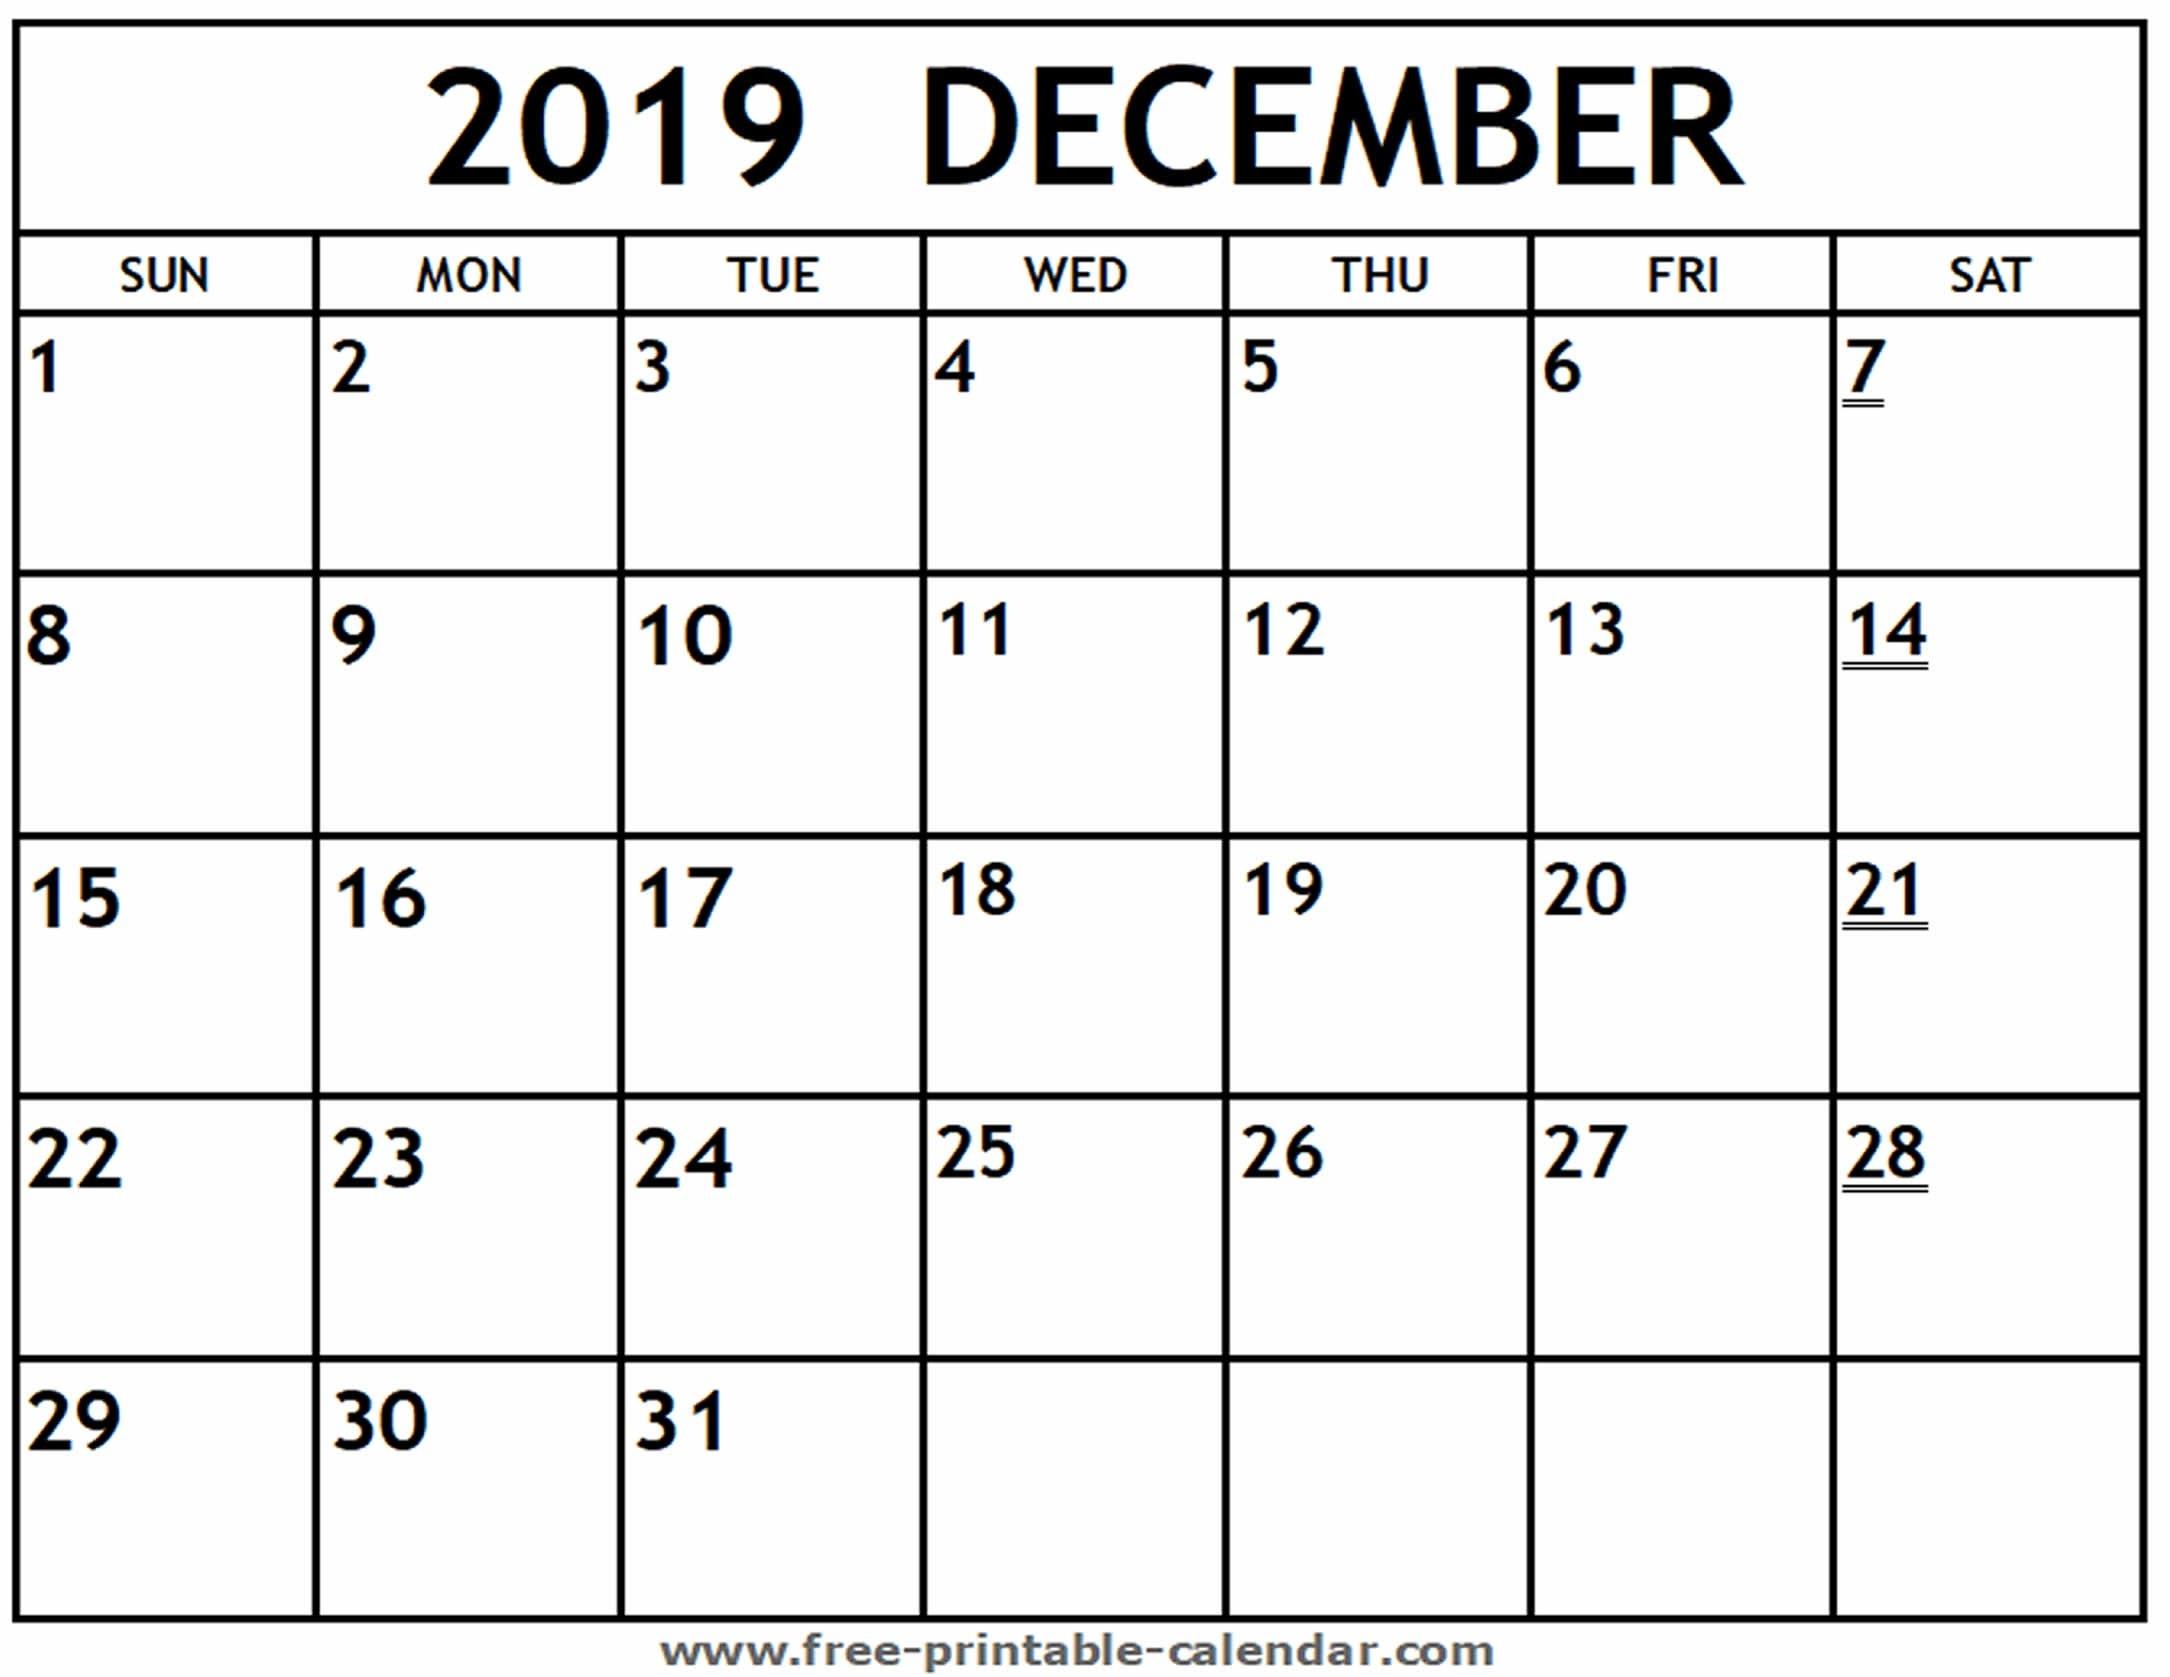 Printable 2019 December Calendar - Free-Printable-Calendar-December Canada Printable Calendar Free Monthly